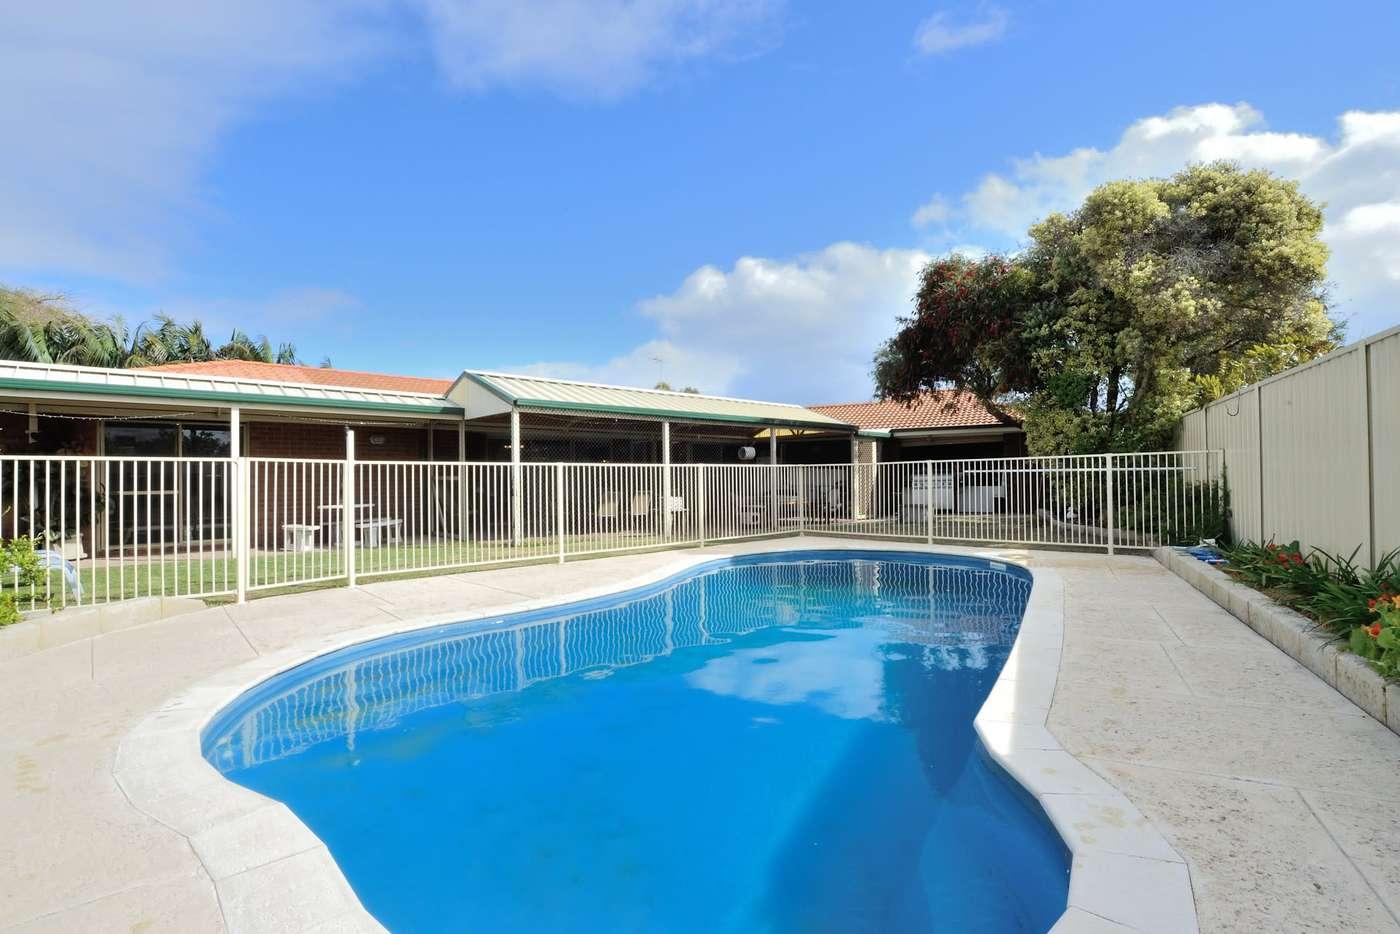 Main view of Homely house listing, 9 Kybra Mews, Rockingham WA 6168